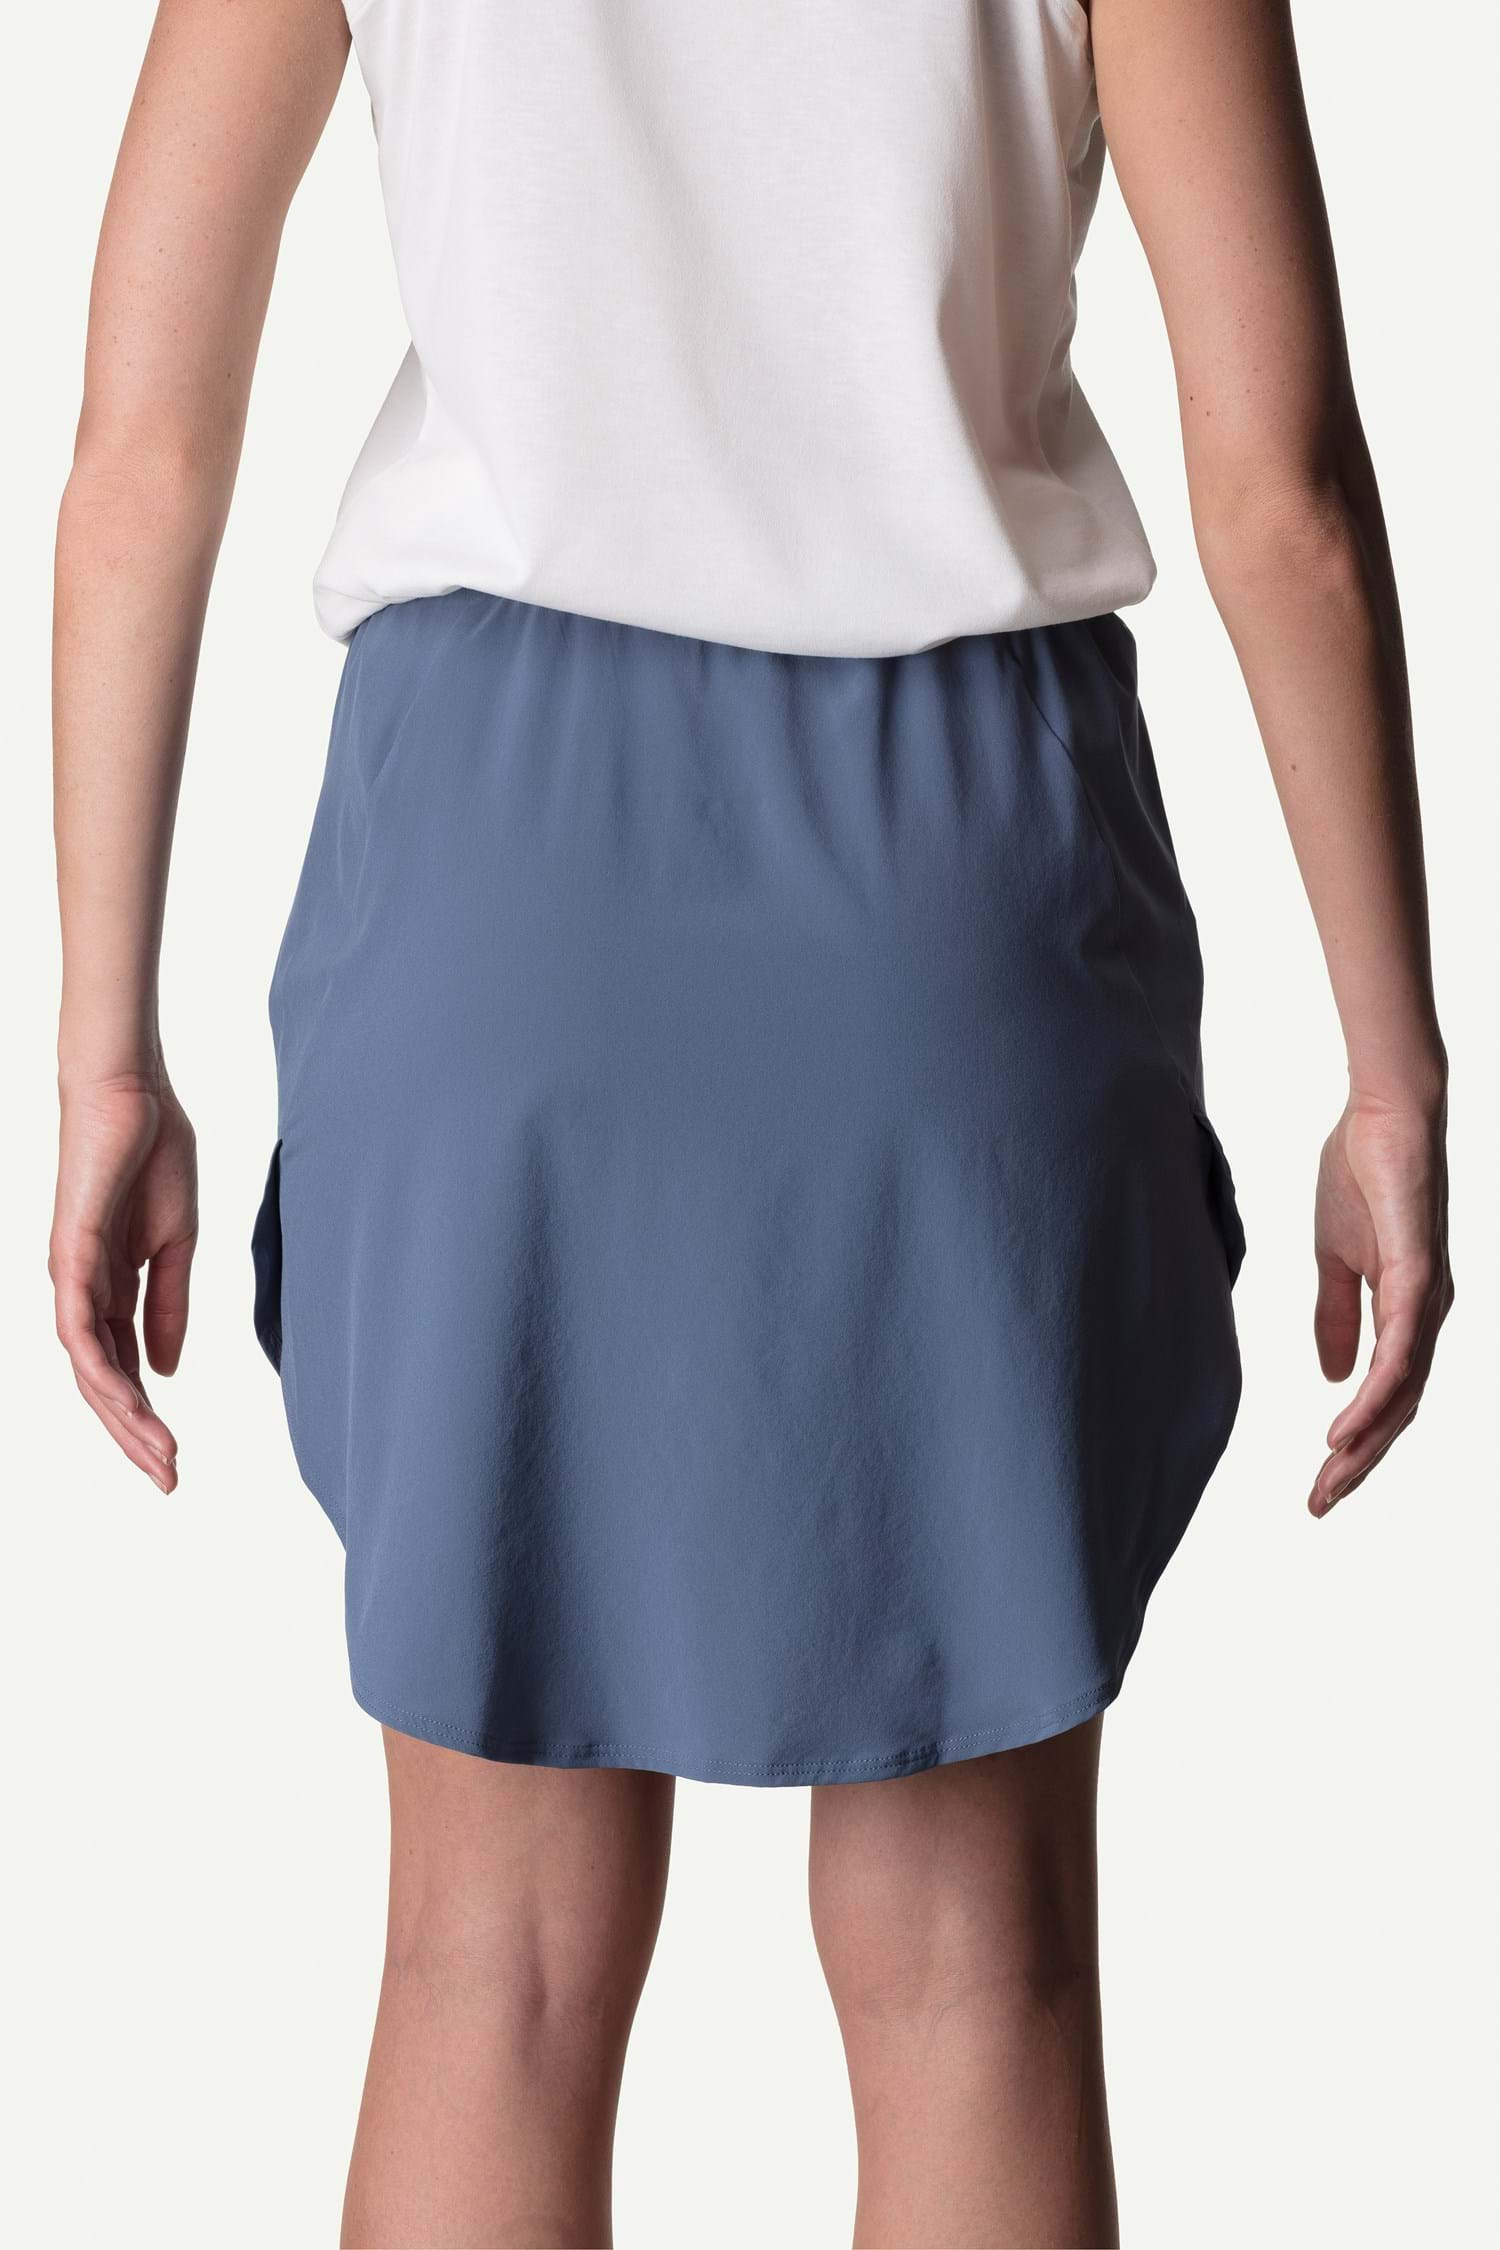 aa58b3f76 Shop Women's Dresses and Skirts - Houdini Sportswear